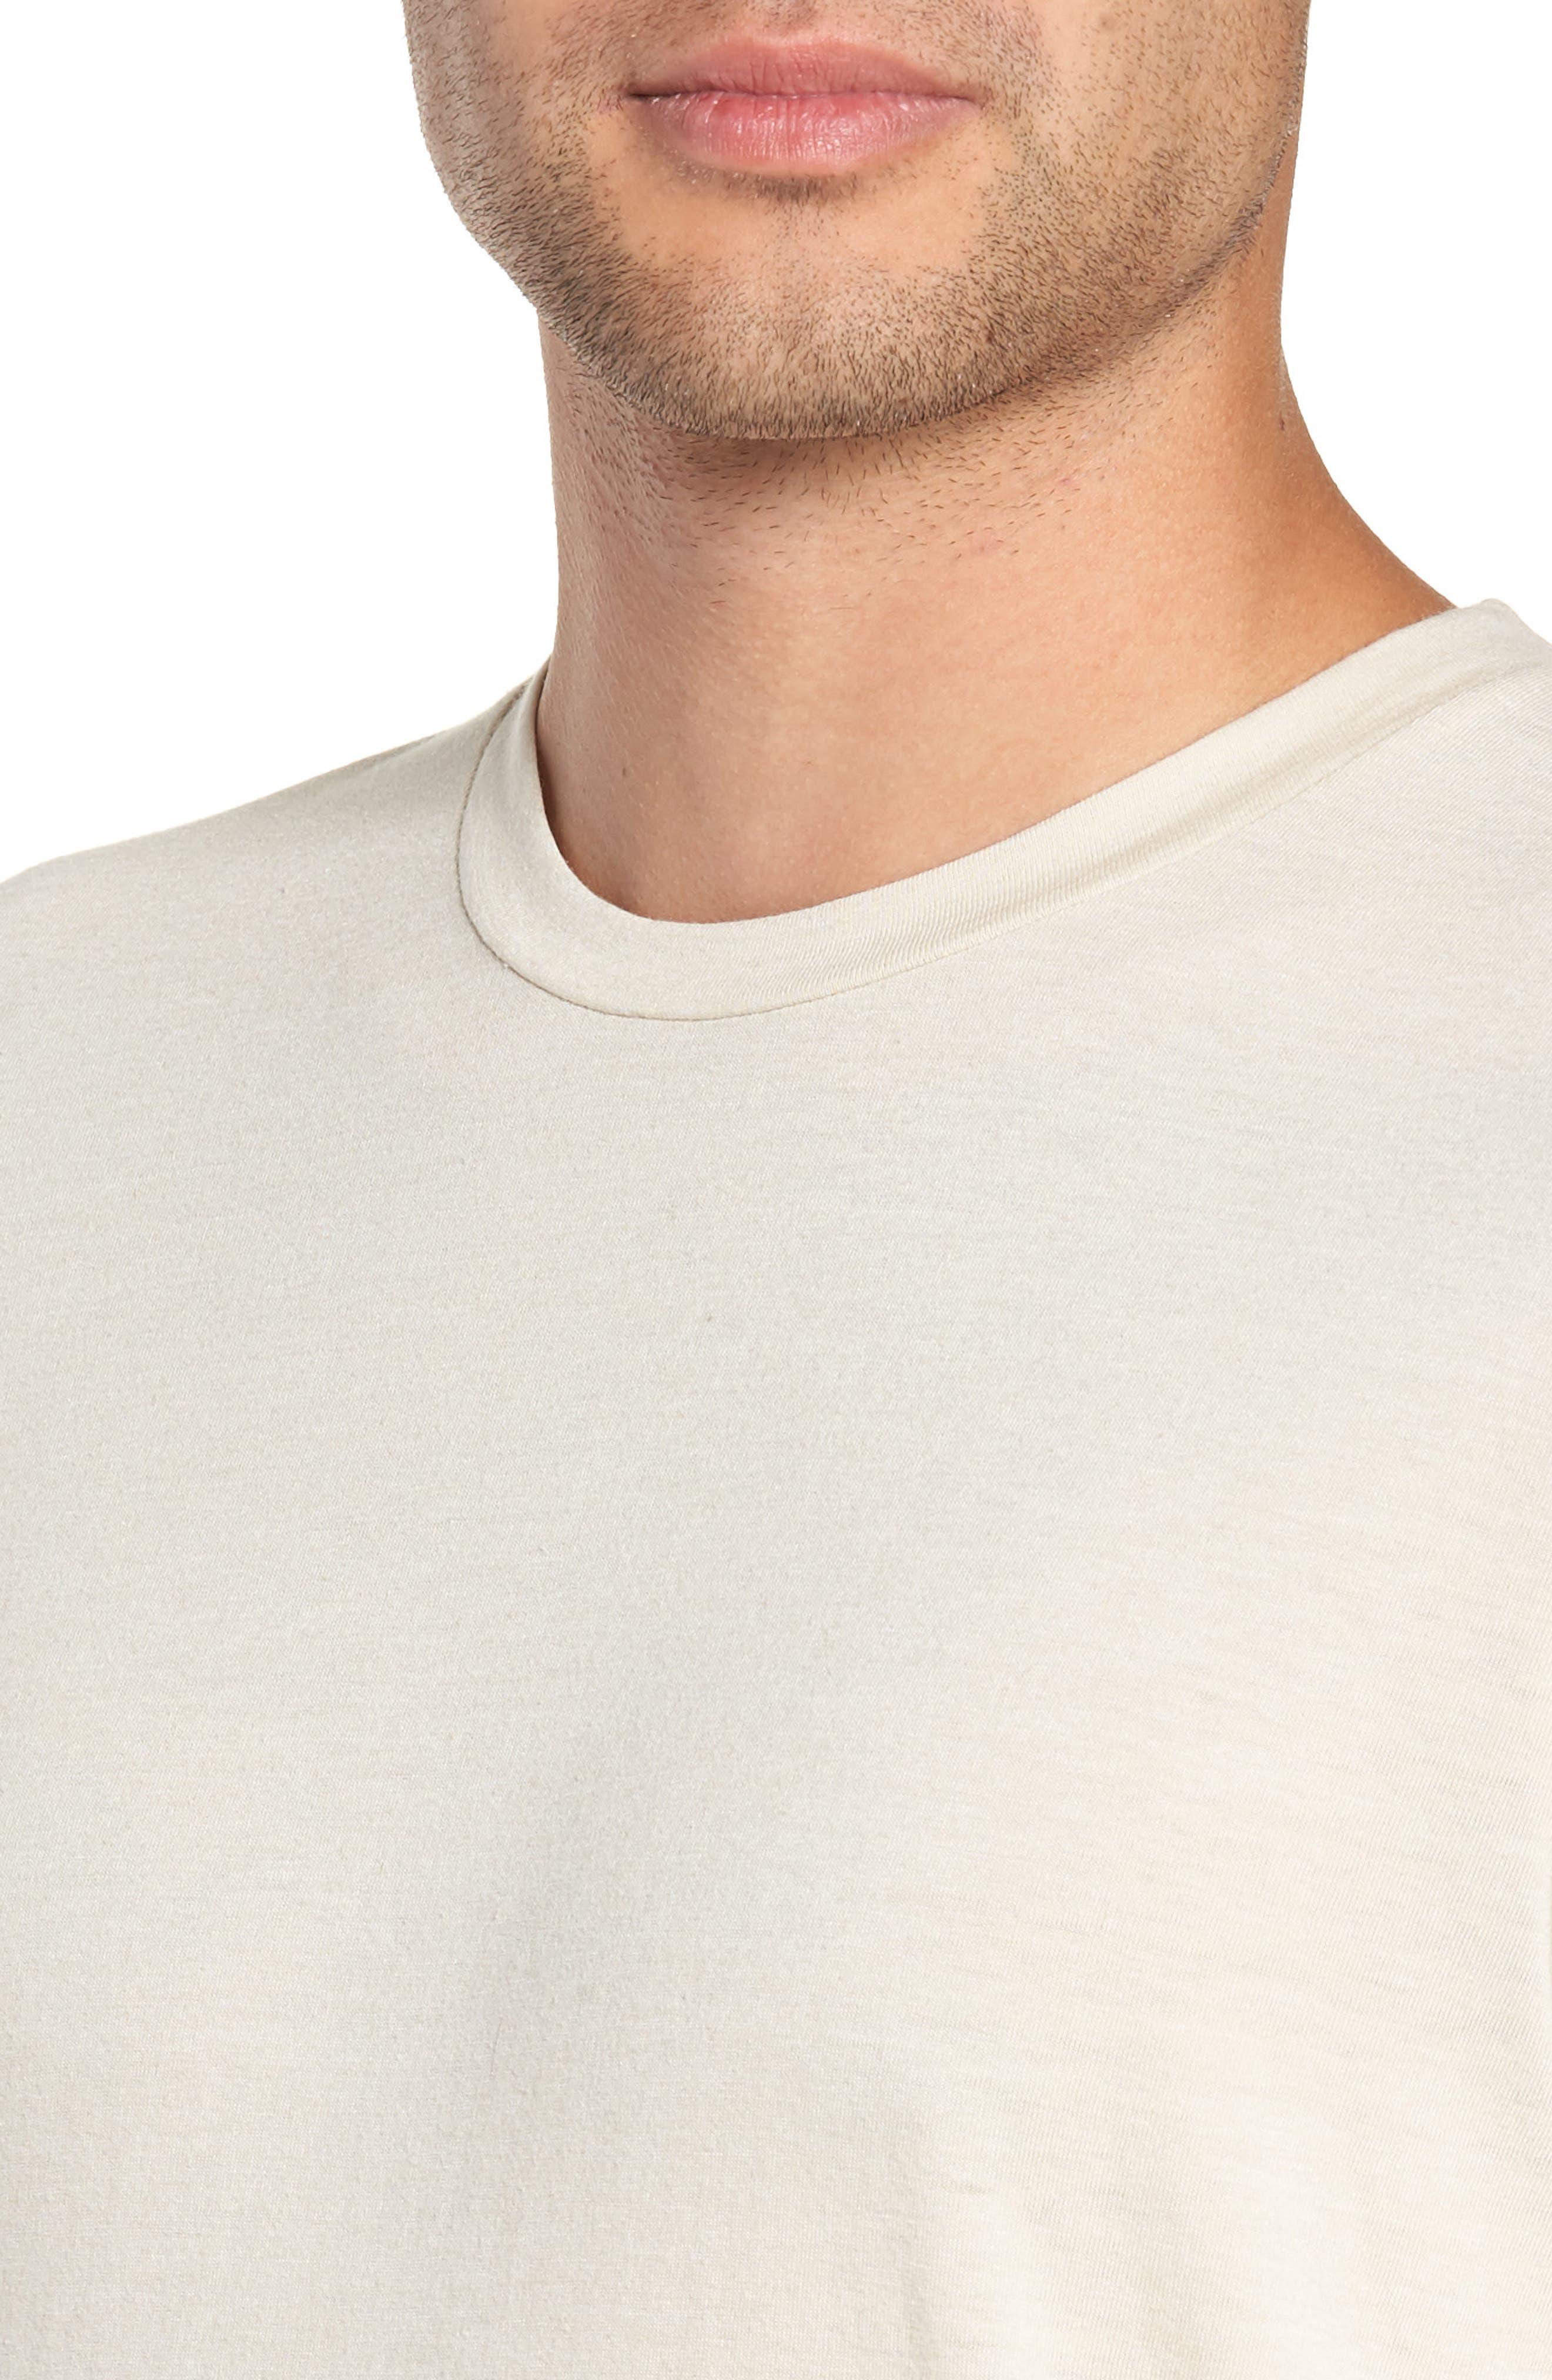 GOODLIFE, Scallop Triblend Crewneck T-Shirt, Alternate thumbnail 4, color, OYSTER